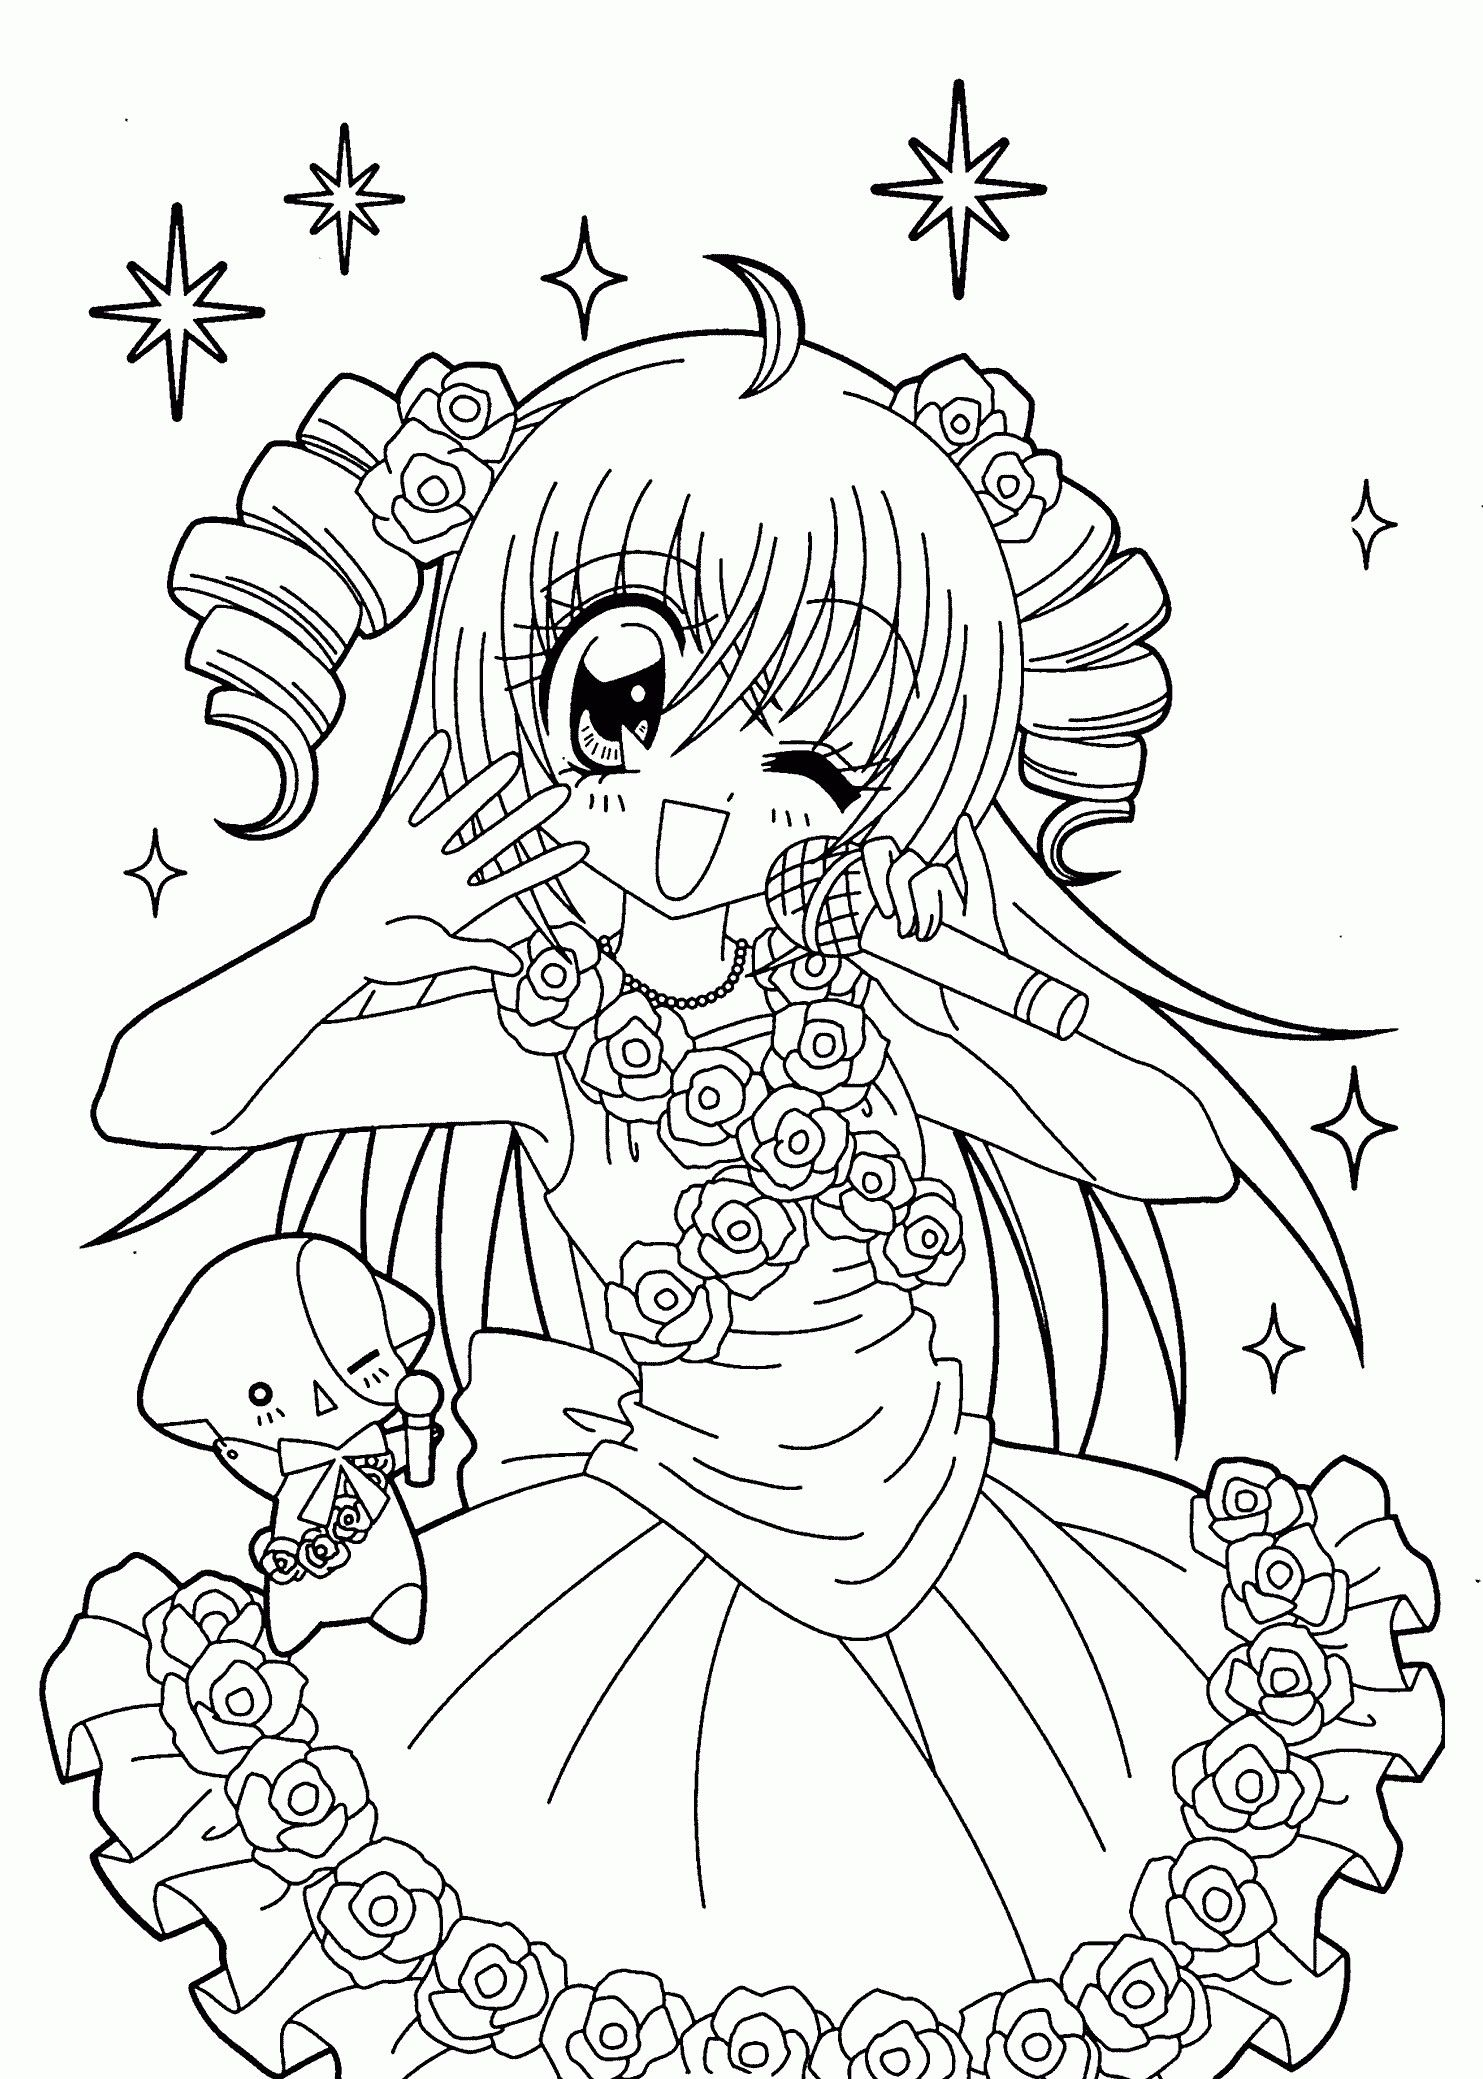 Coloring drawing kilari manga print for coloring page print petite fille en 2019 coloriage - Coloriage manga difficile ...